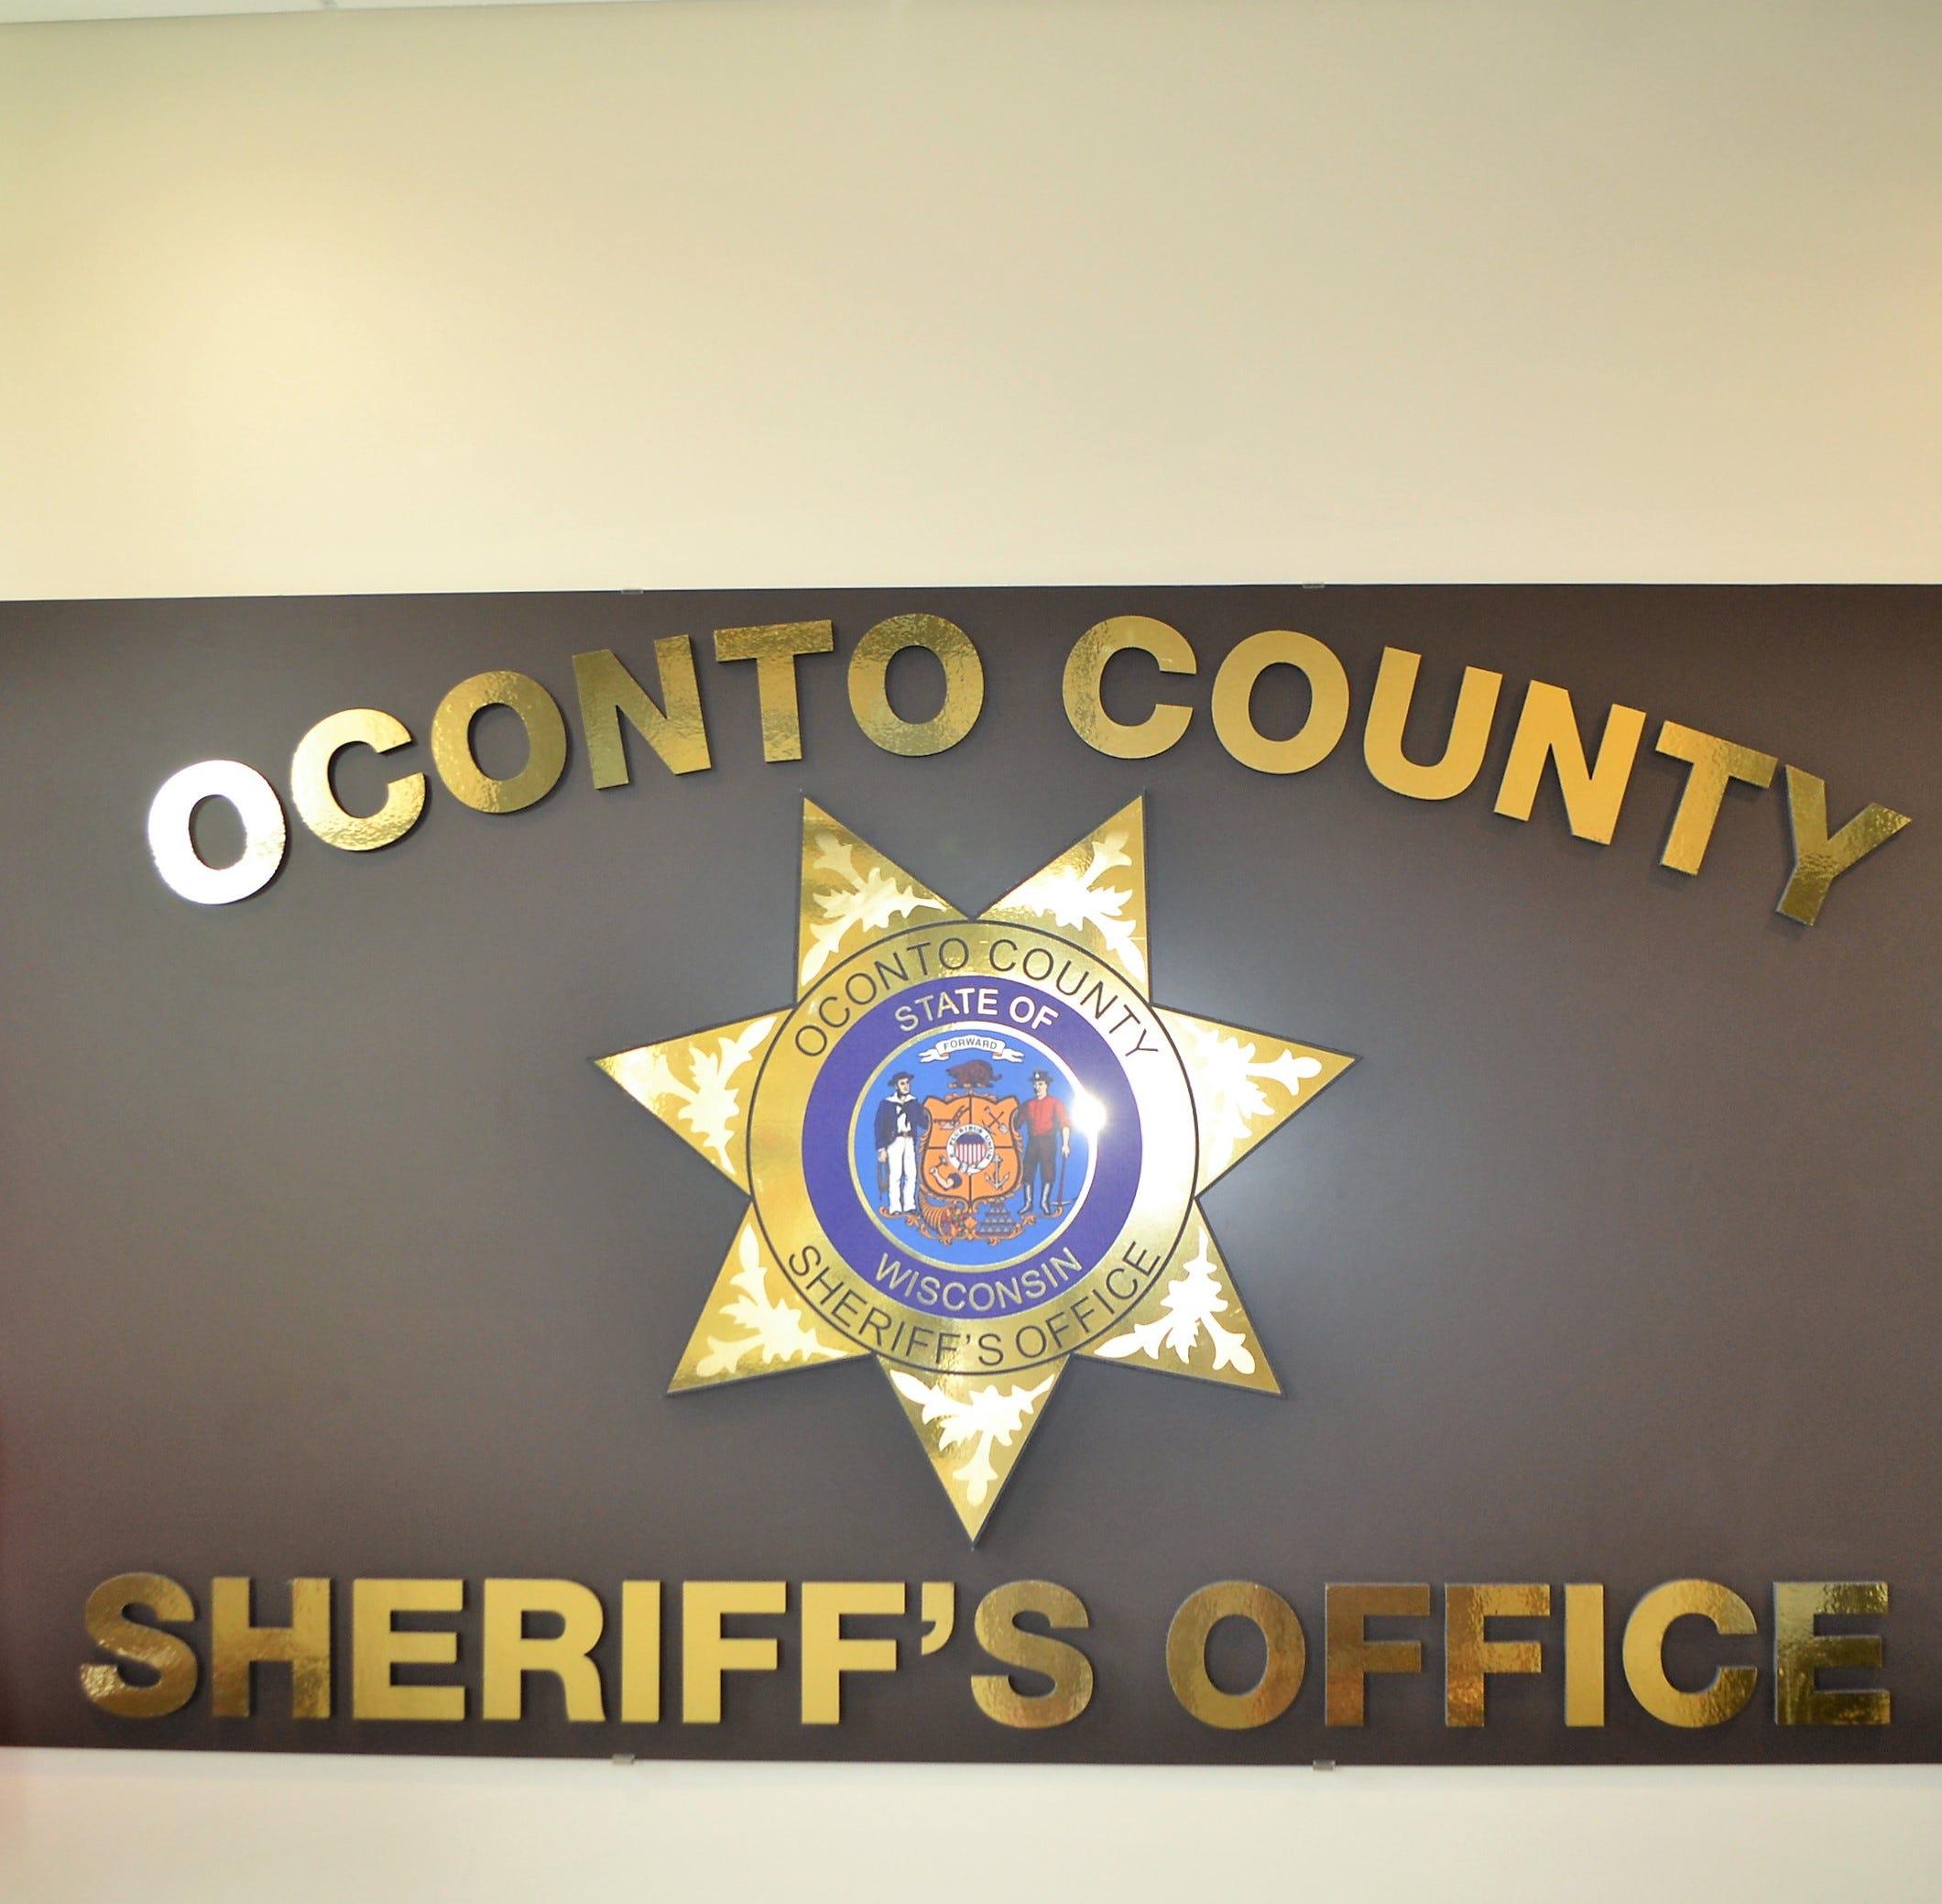 Primary election: Janke, Skarban vie for Oconto County sheriff's post